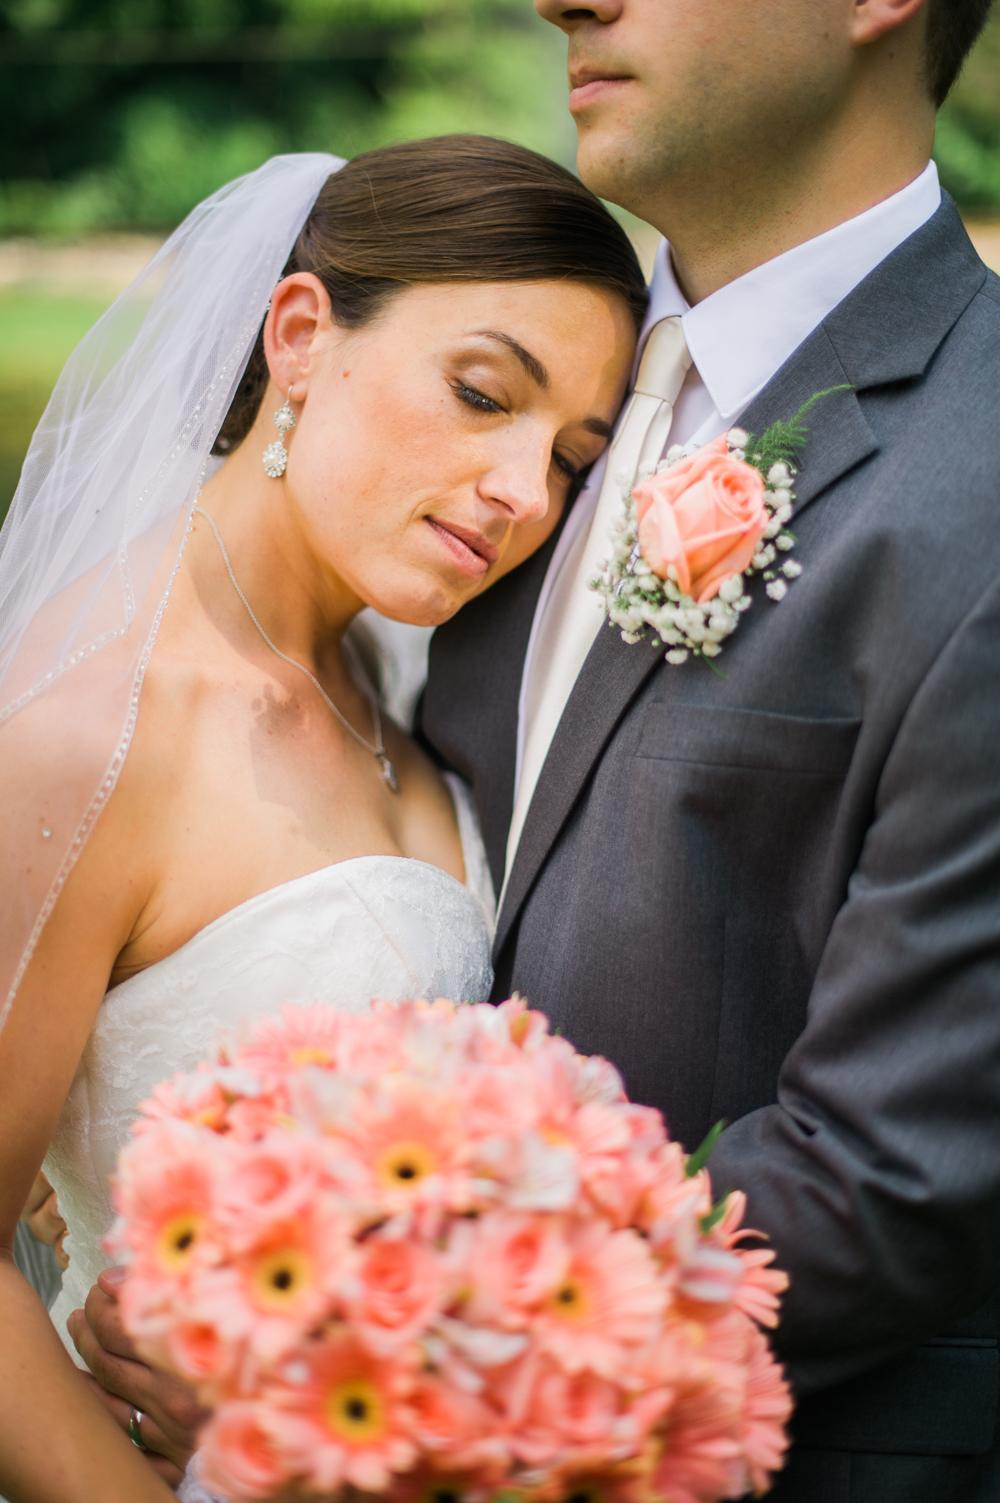 Mendenhall_Inn_Wedding_Pennsylvania_Rebecca_Watkins_Photography_2014-051.jpg